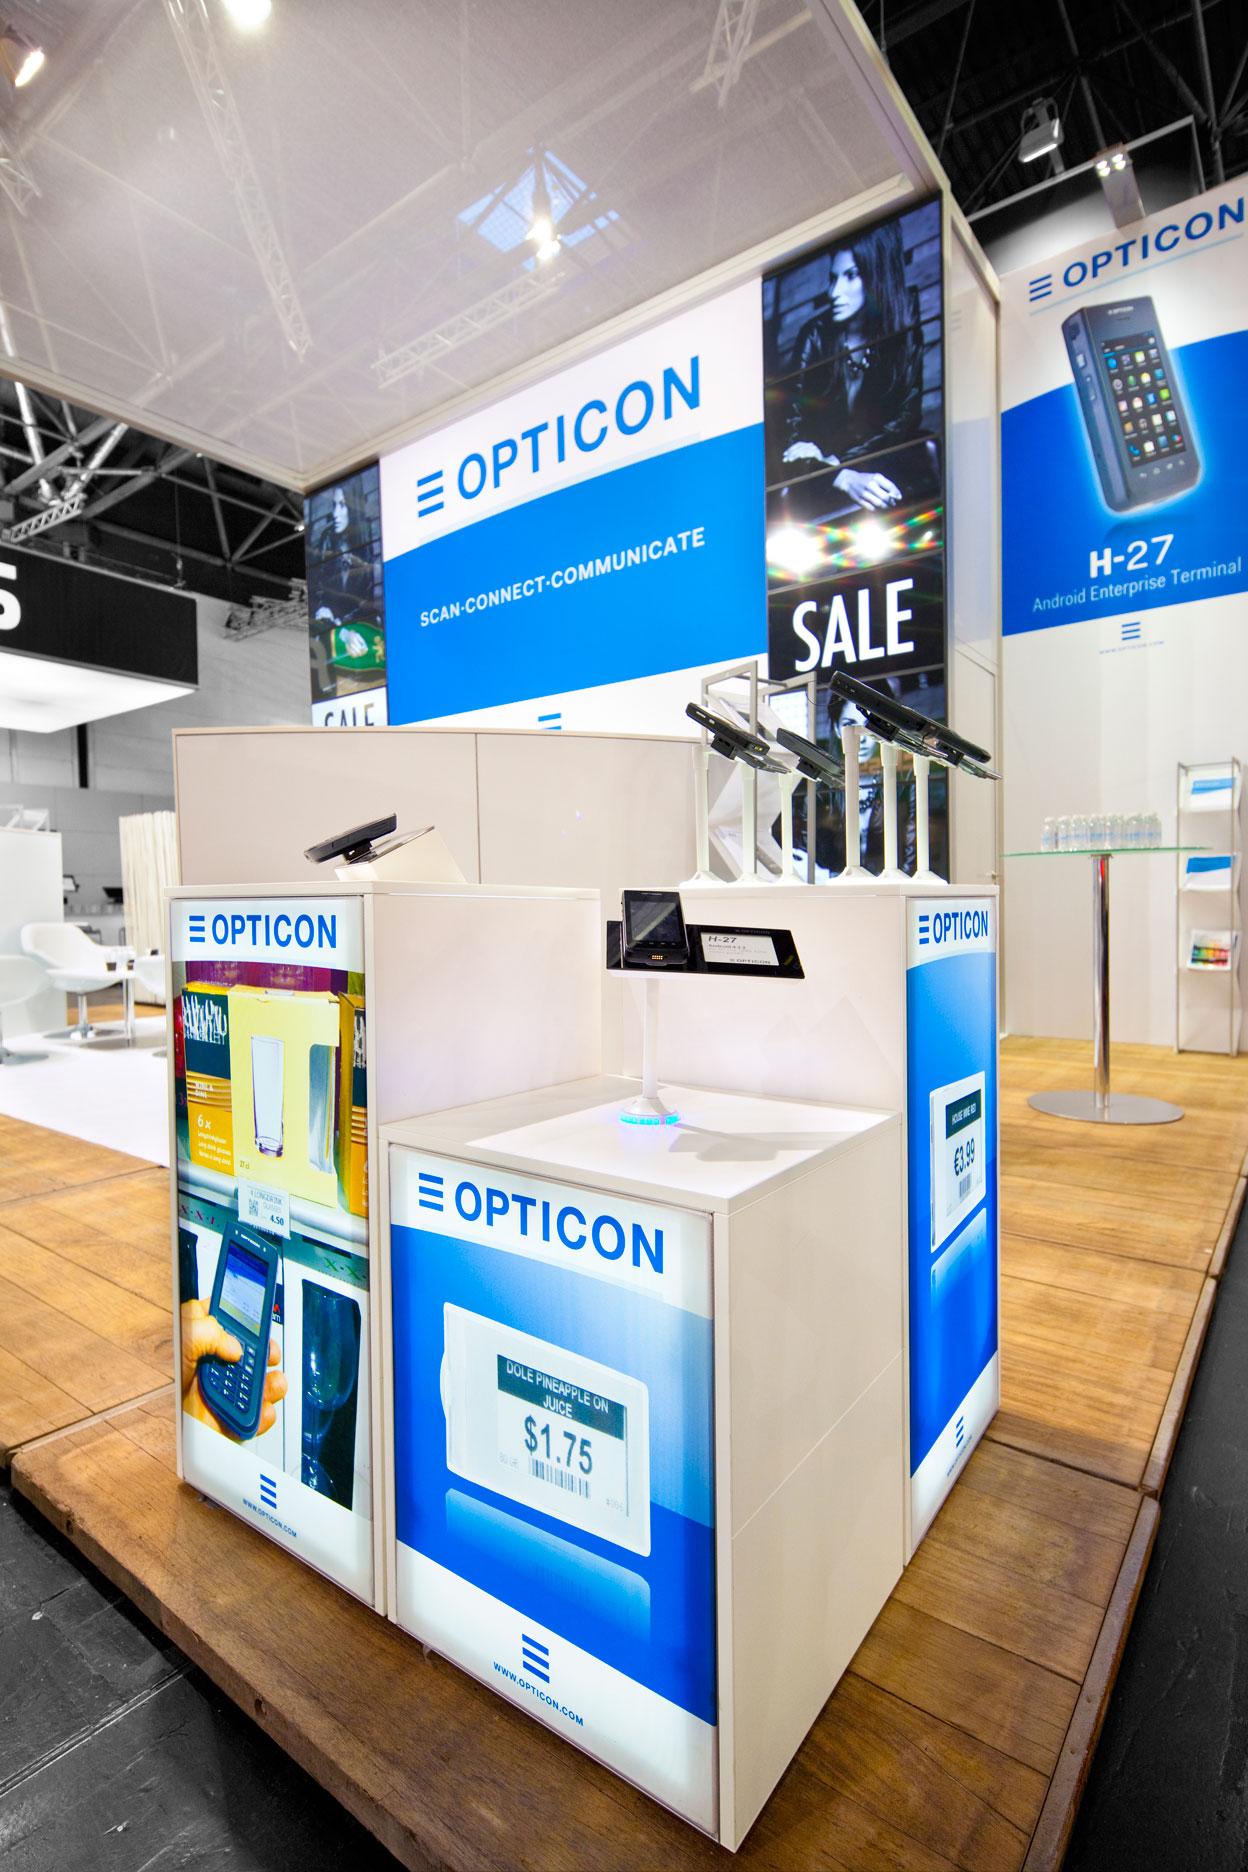 Buck-Design---Opticon---EURO-Cis-2015---Standbouwfotografie-#2366-B+.jpg